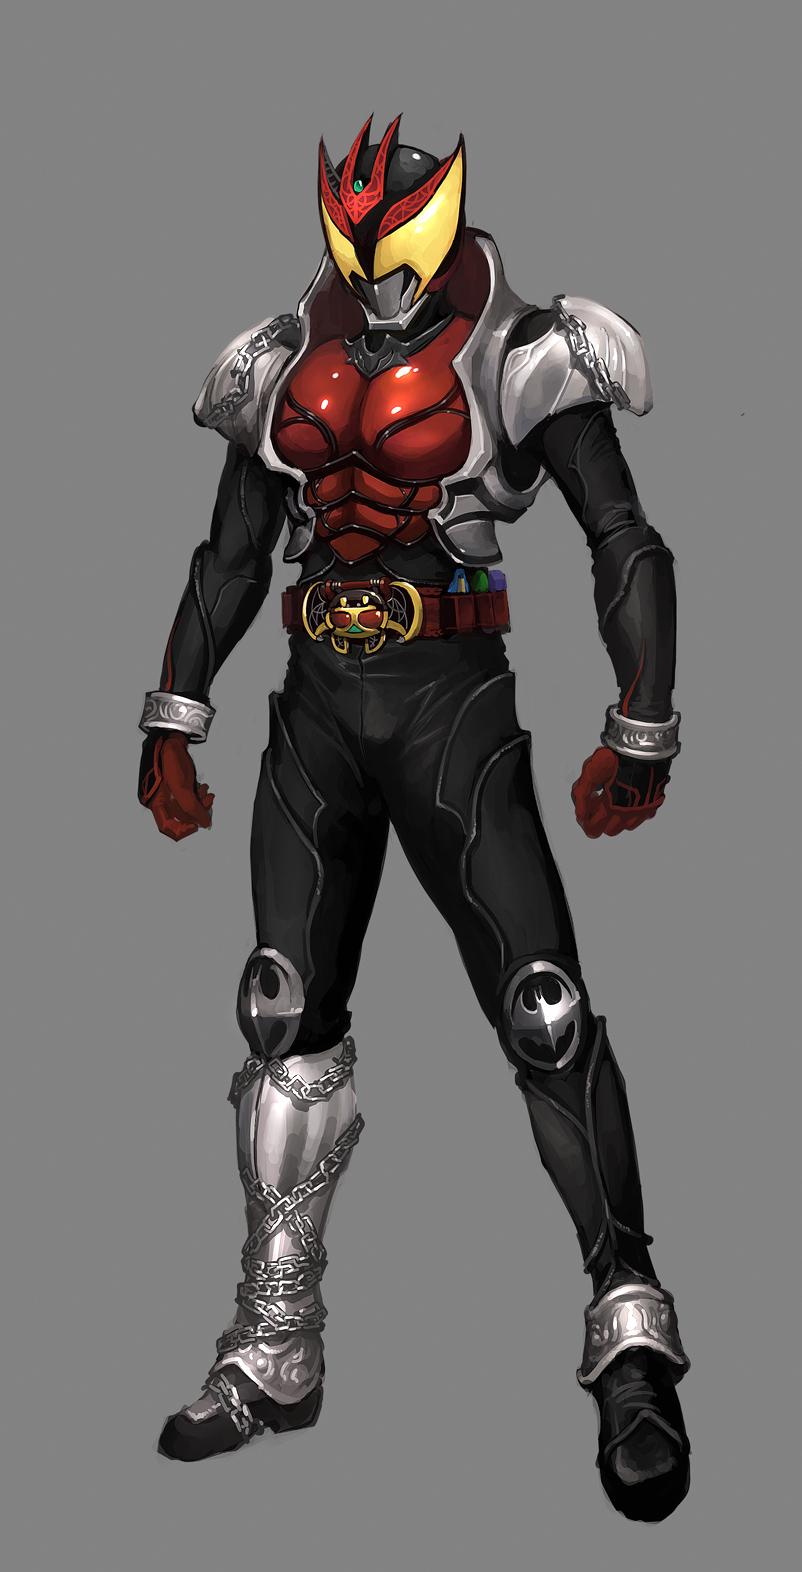 Rough - Kamen Rider Kiva by reaper78